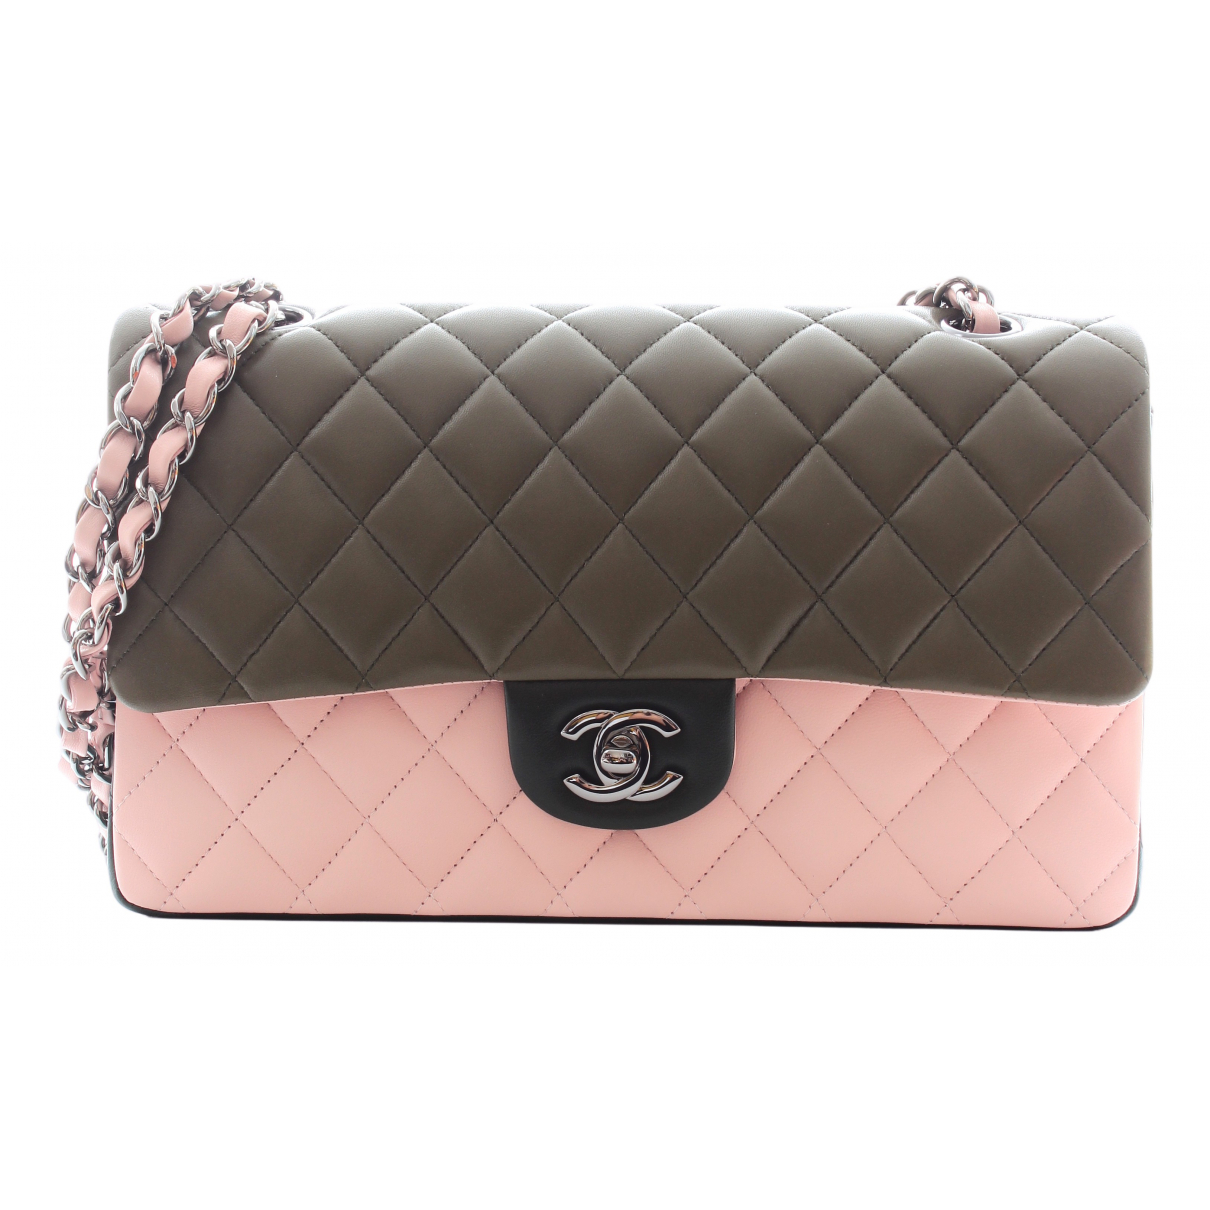 Chanel Timeless/Classique Handtasche in  Bunt Leder